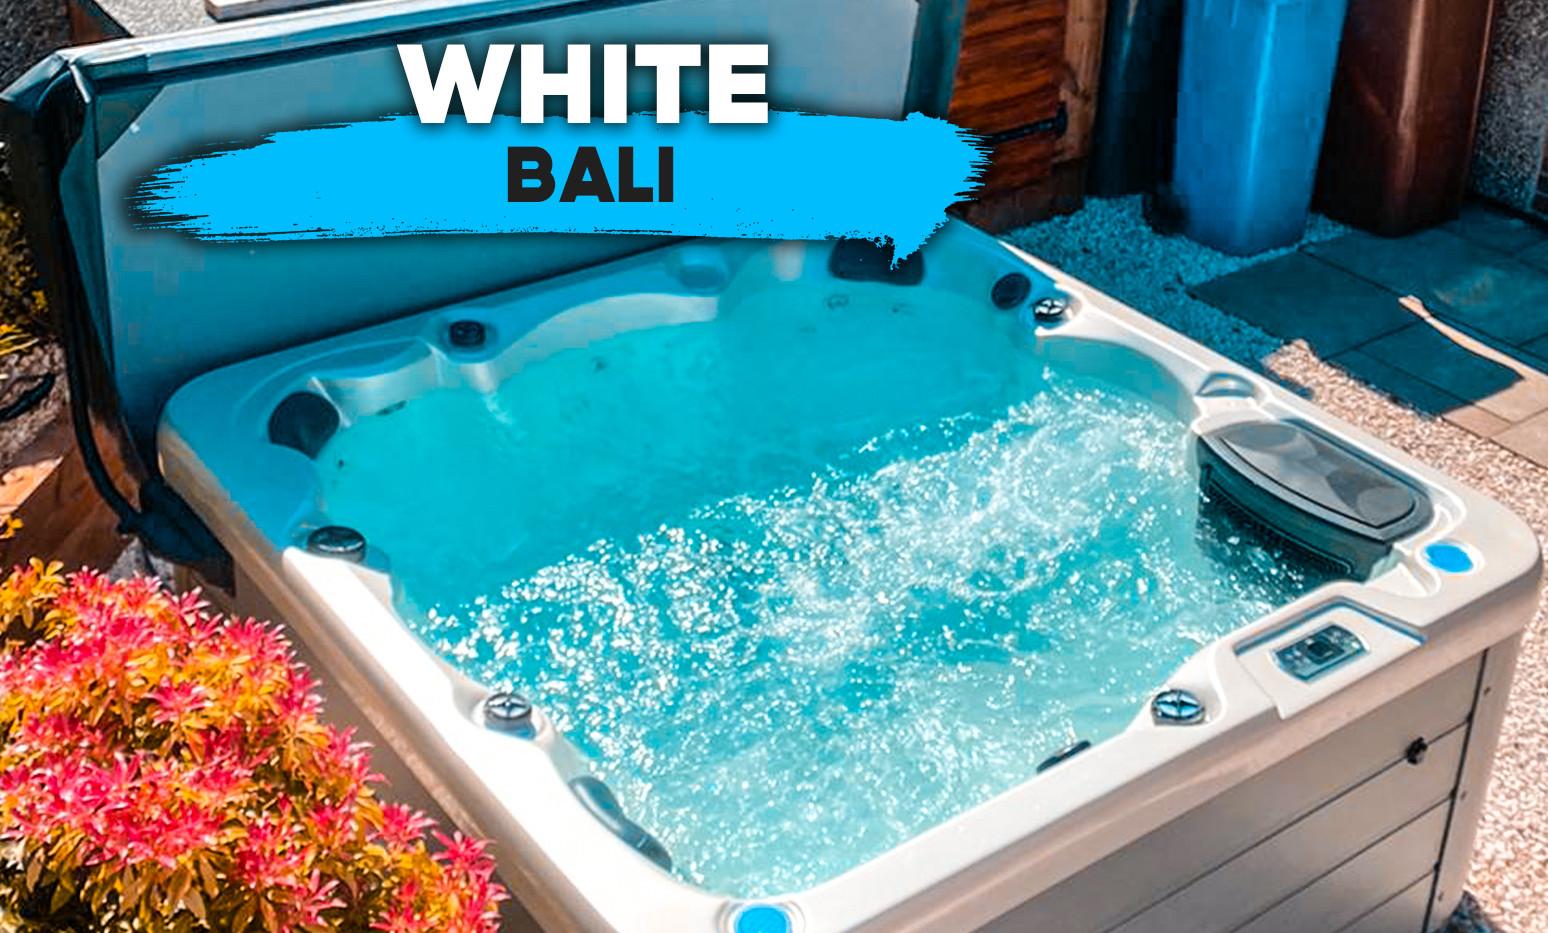 Bali_PreviousInstall_WHITE.jpg